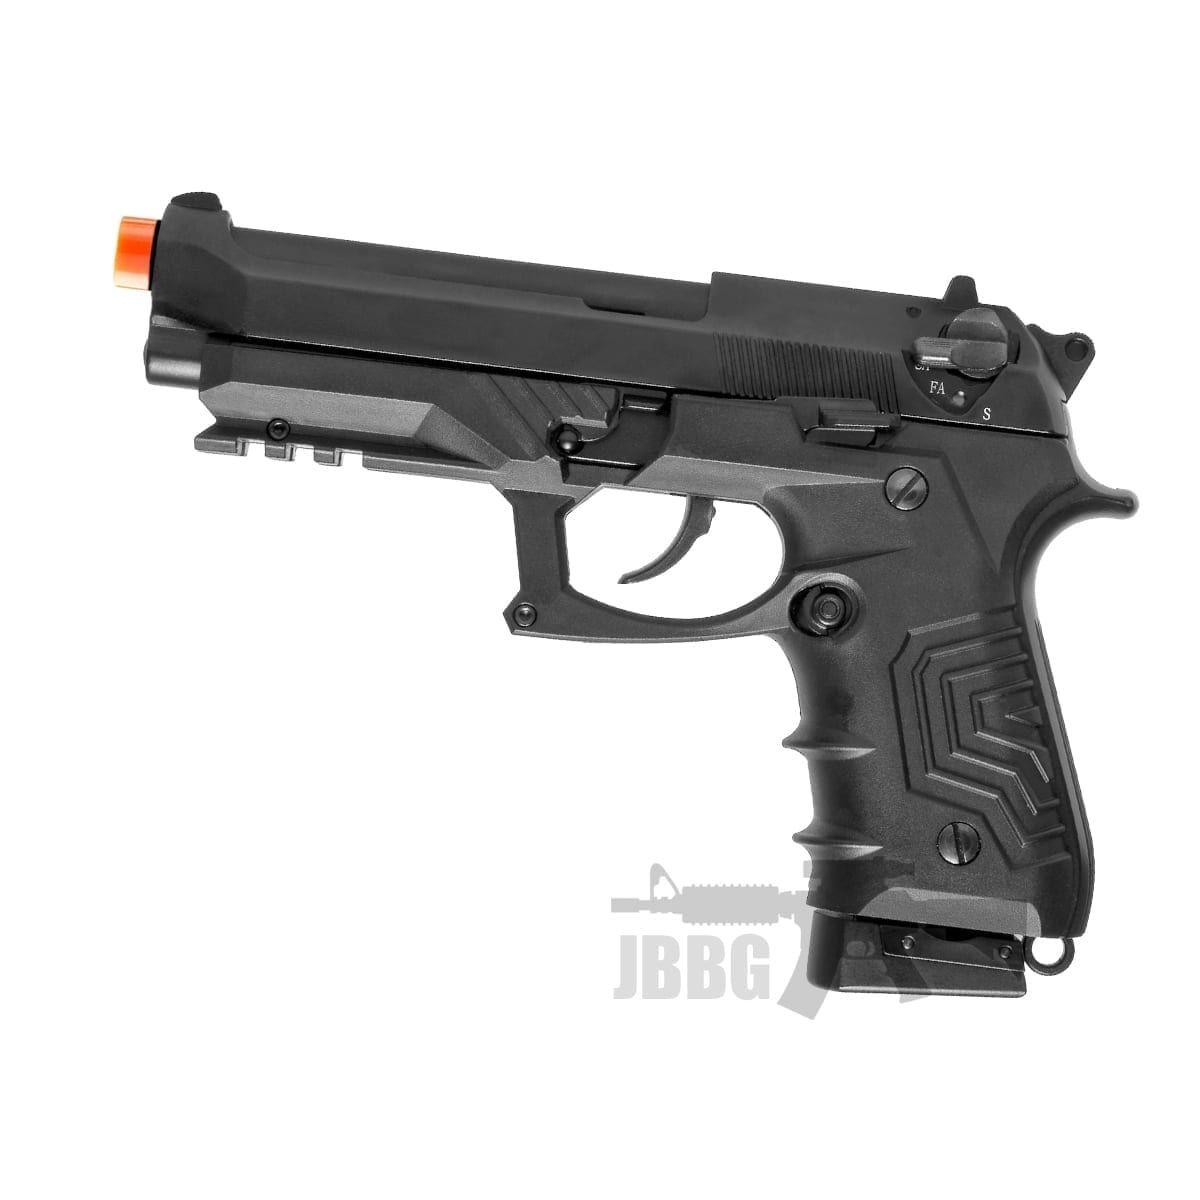 hg173 aitsoft pistol